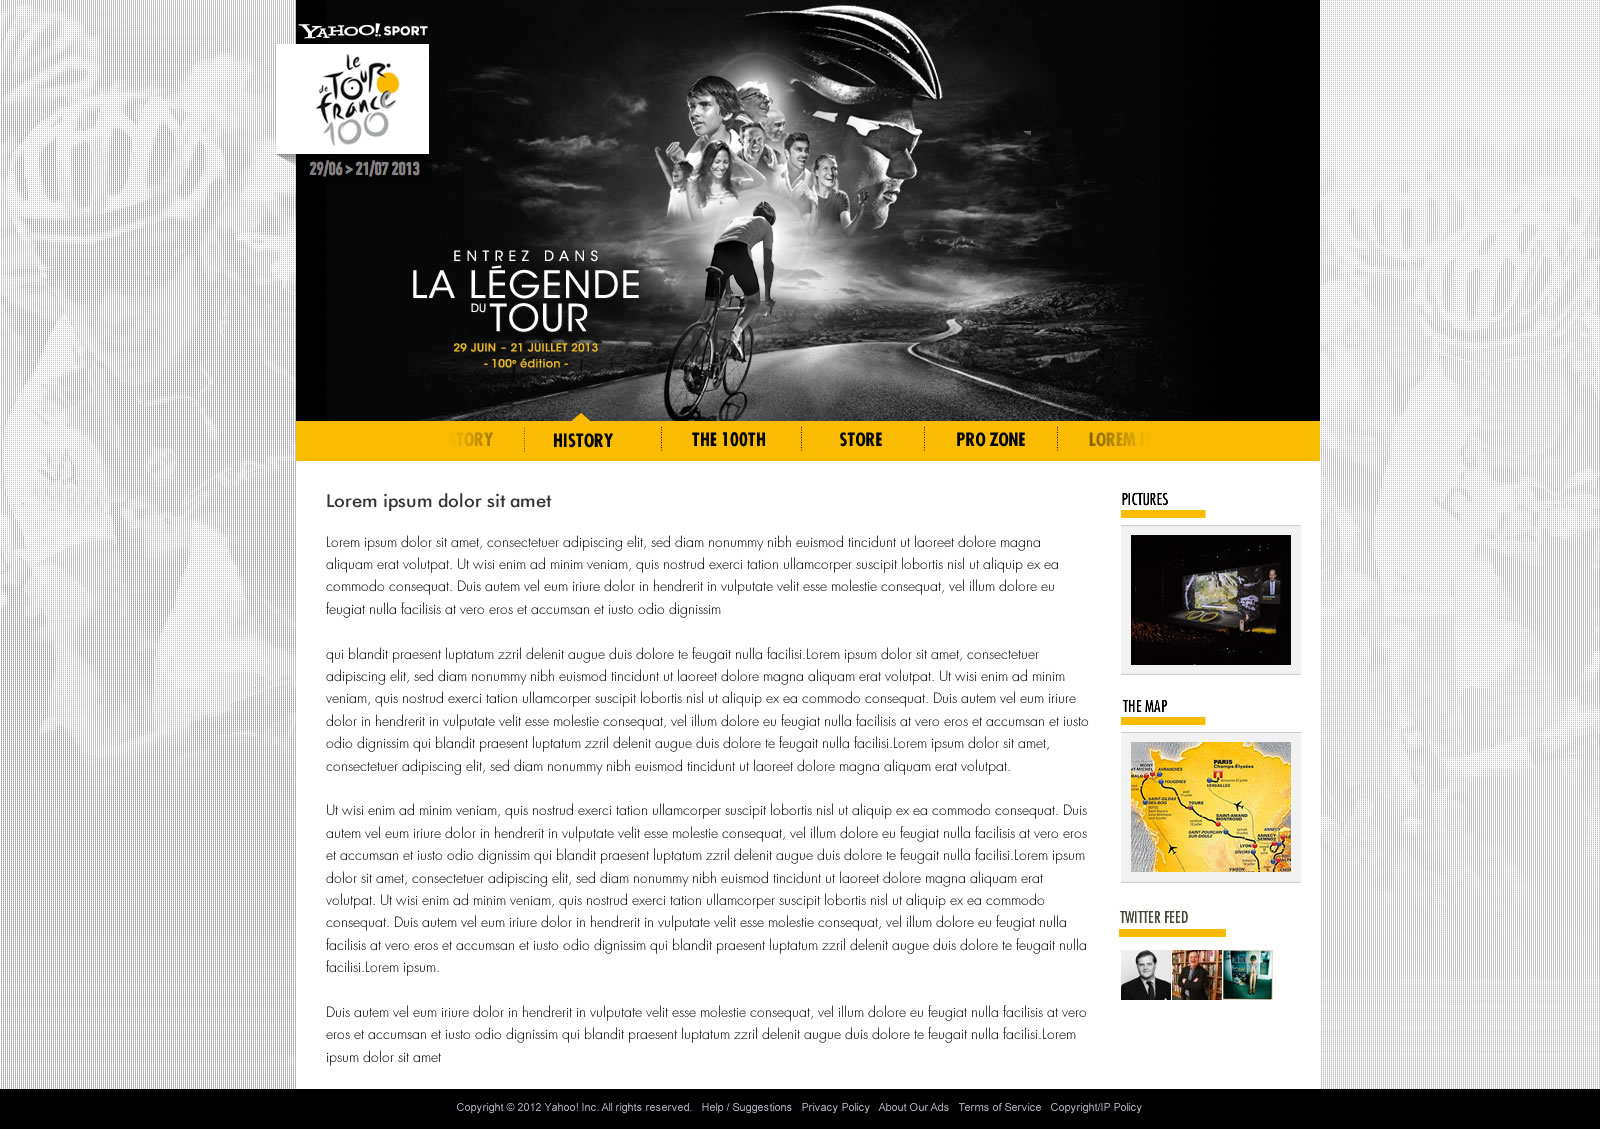 tourDeFrance-articlepage.jpg